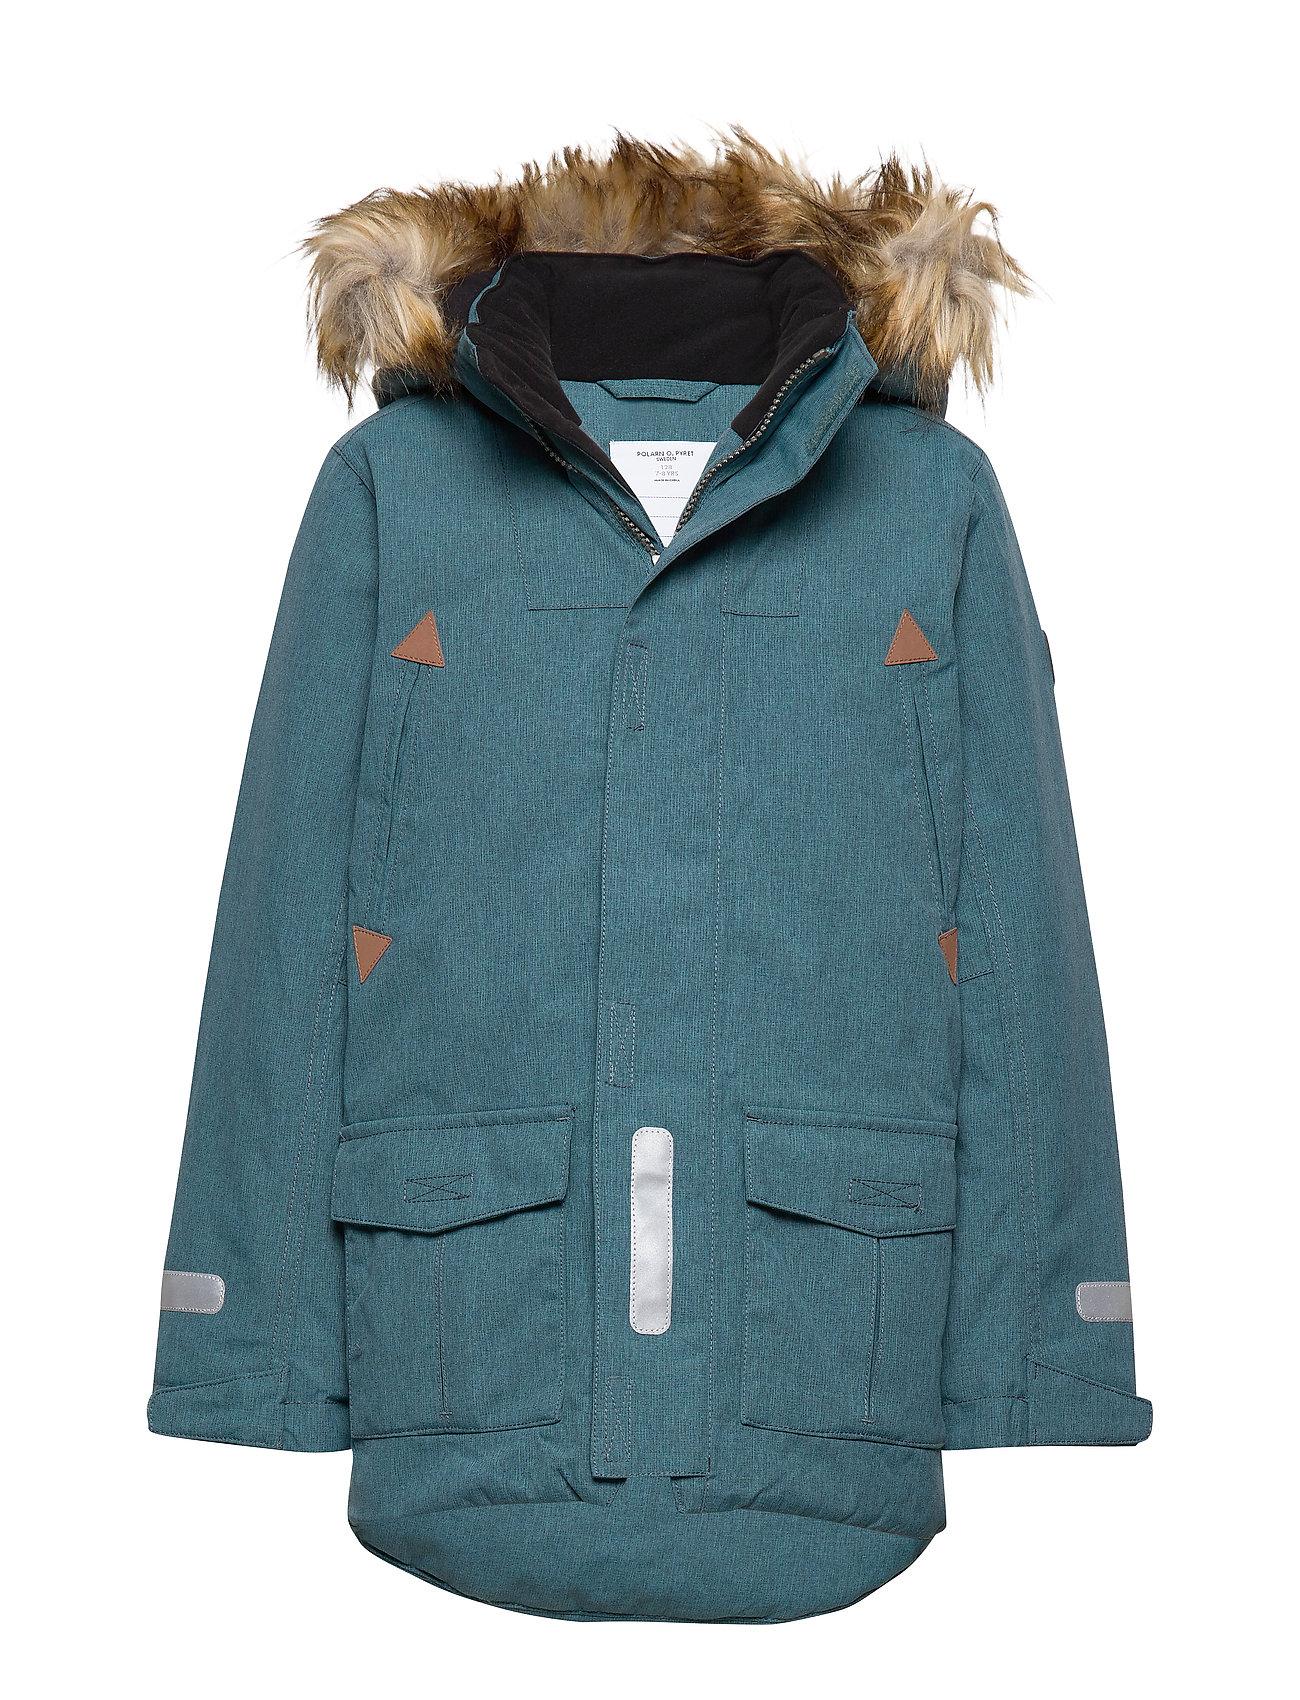 Polarn O. Pyret Jacket Padded w Hood School - STORM BLUE